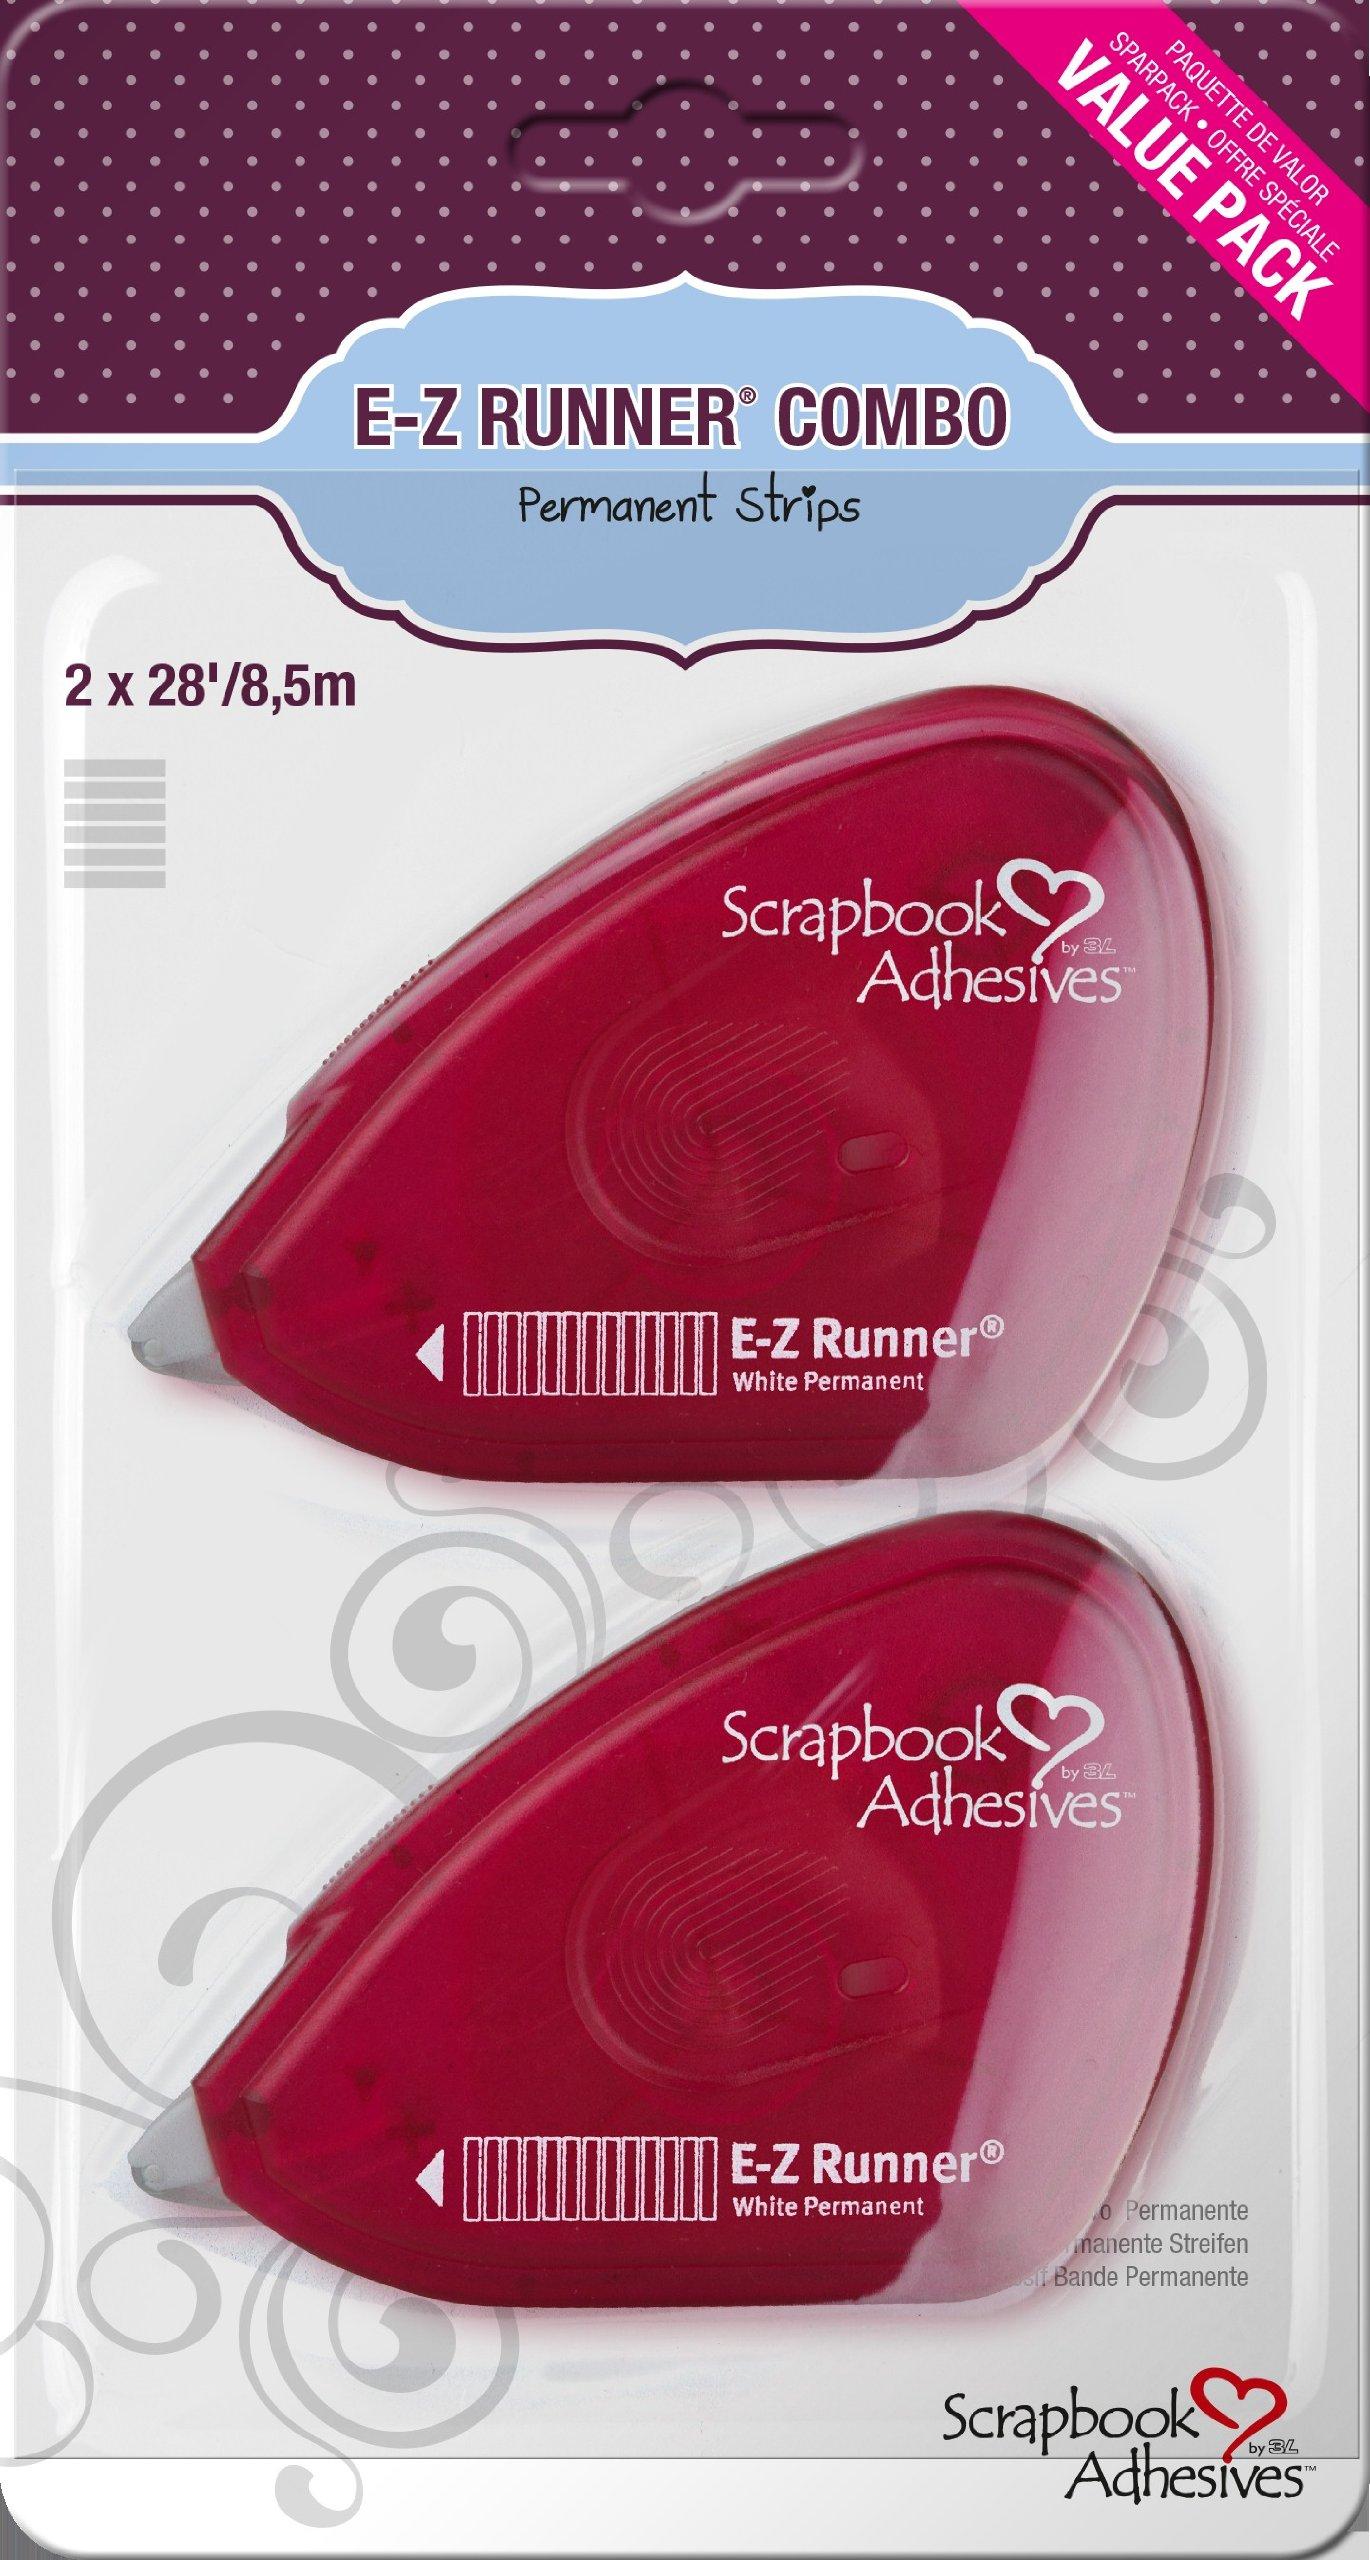 3L Scrapbook Adhesives E-Z Runner Permanent Adhesive Dispenser, 28 Feet, 2-Pack